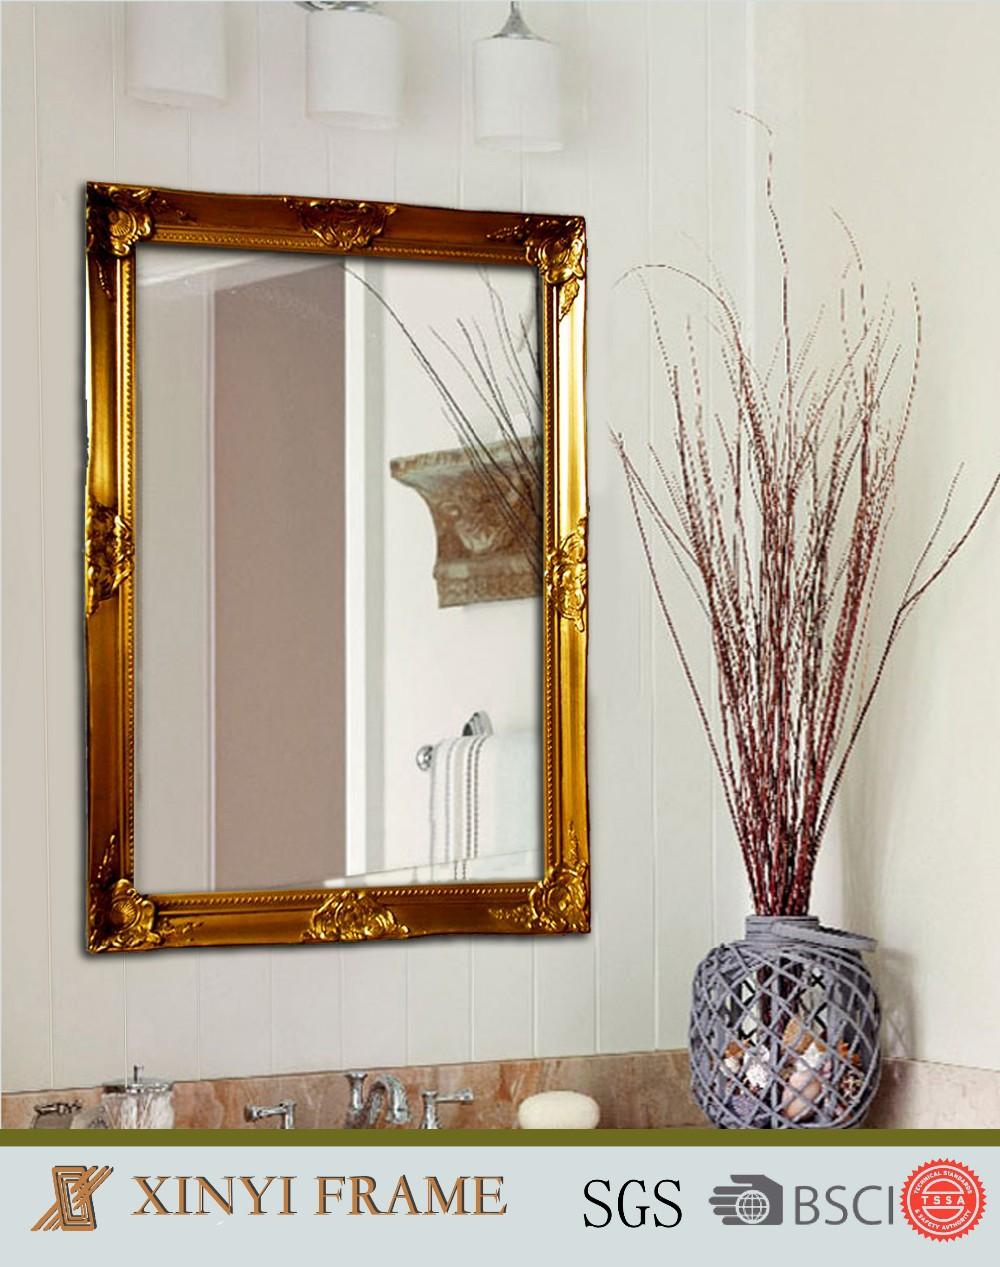 Hiasan Dinding Dekoratif Panjang Penuh Cermin Bingkai Kayu Yang Modern